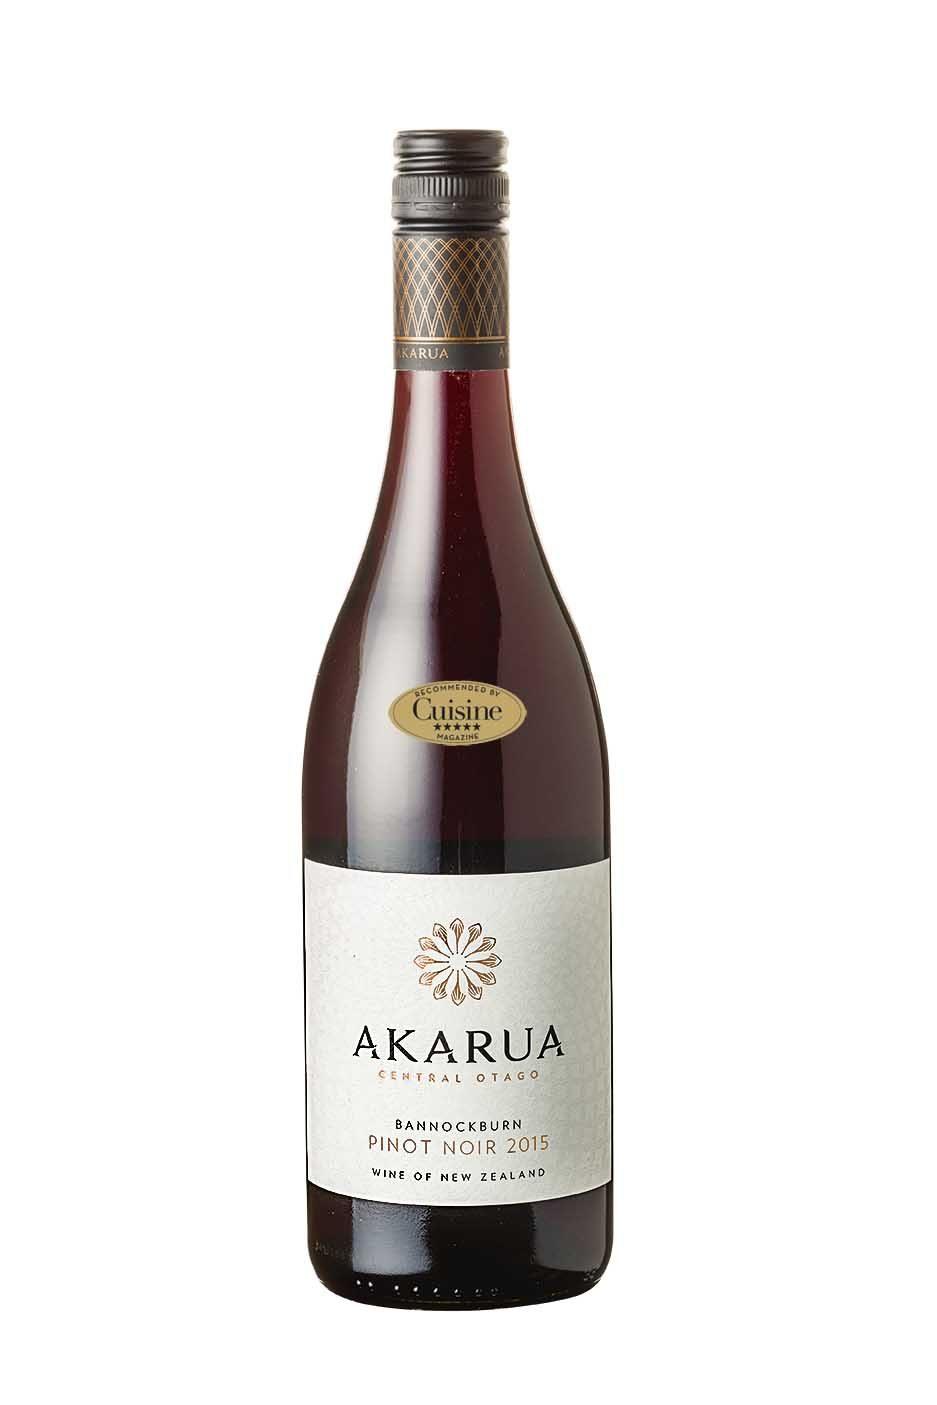 Akarua Pinot Noir 2015 (Central Otago)